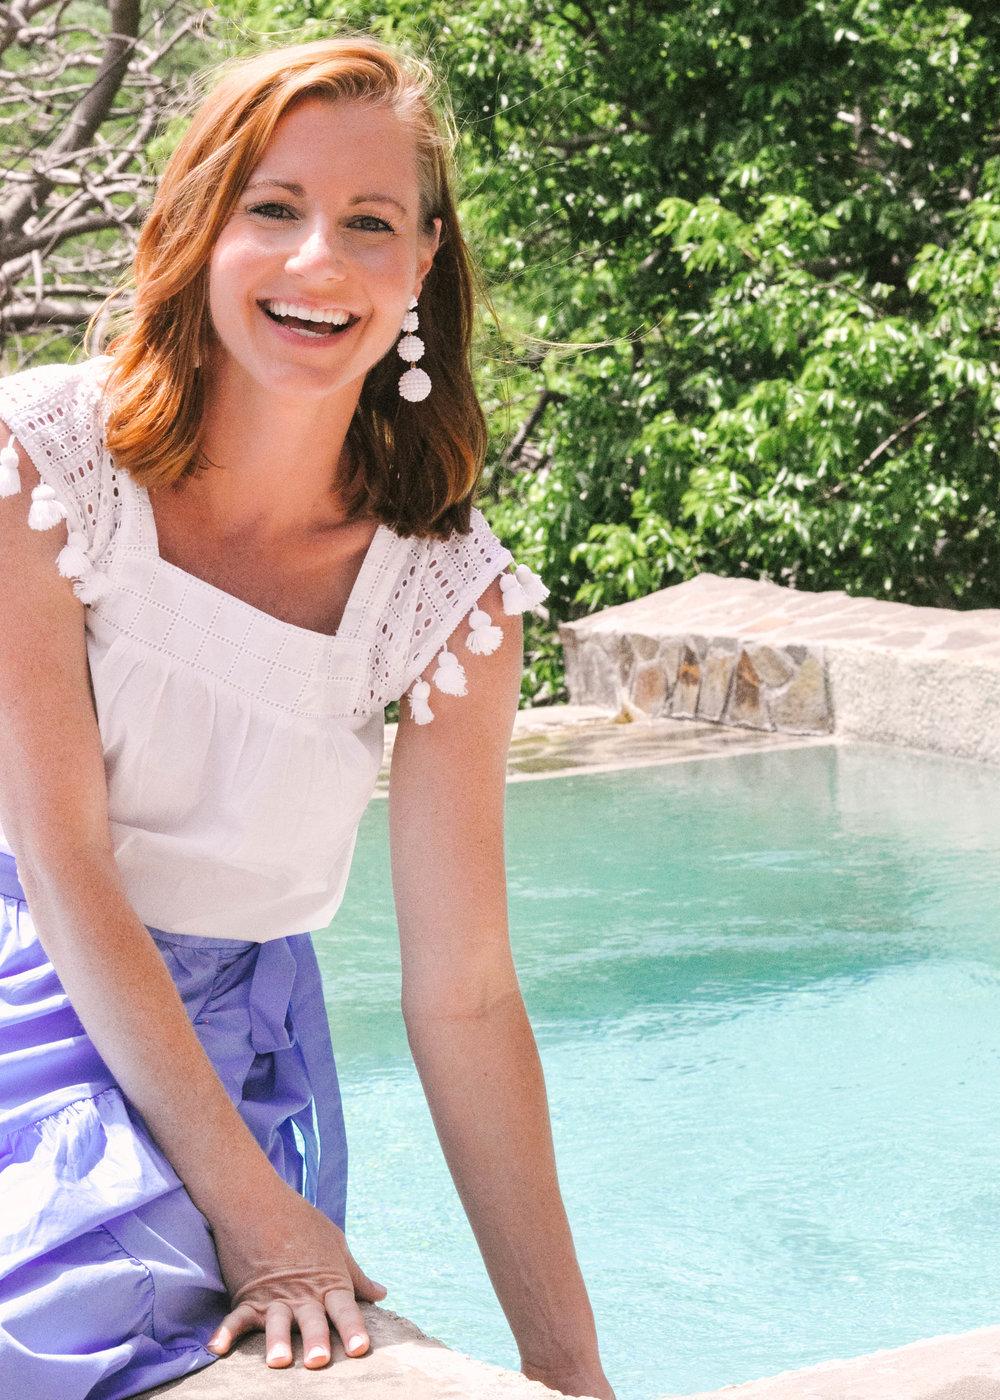 Woman smiling next to pool